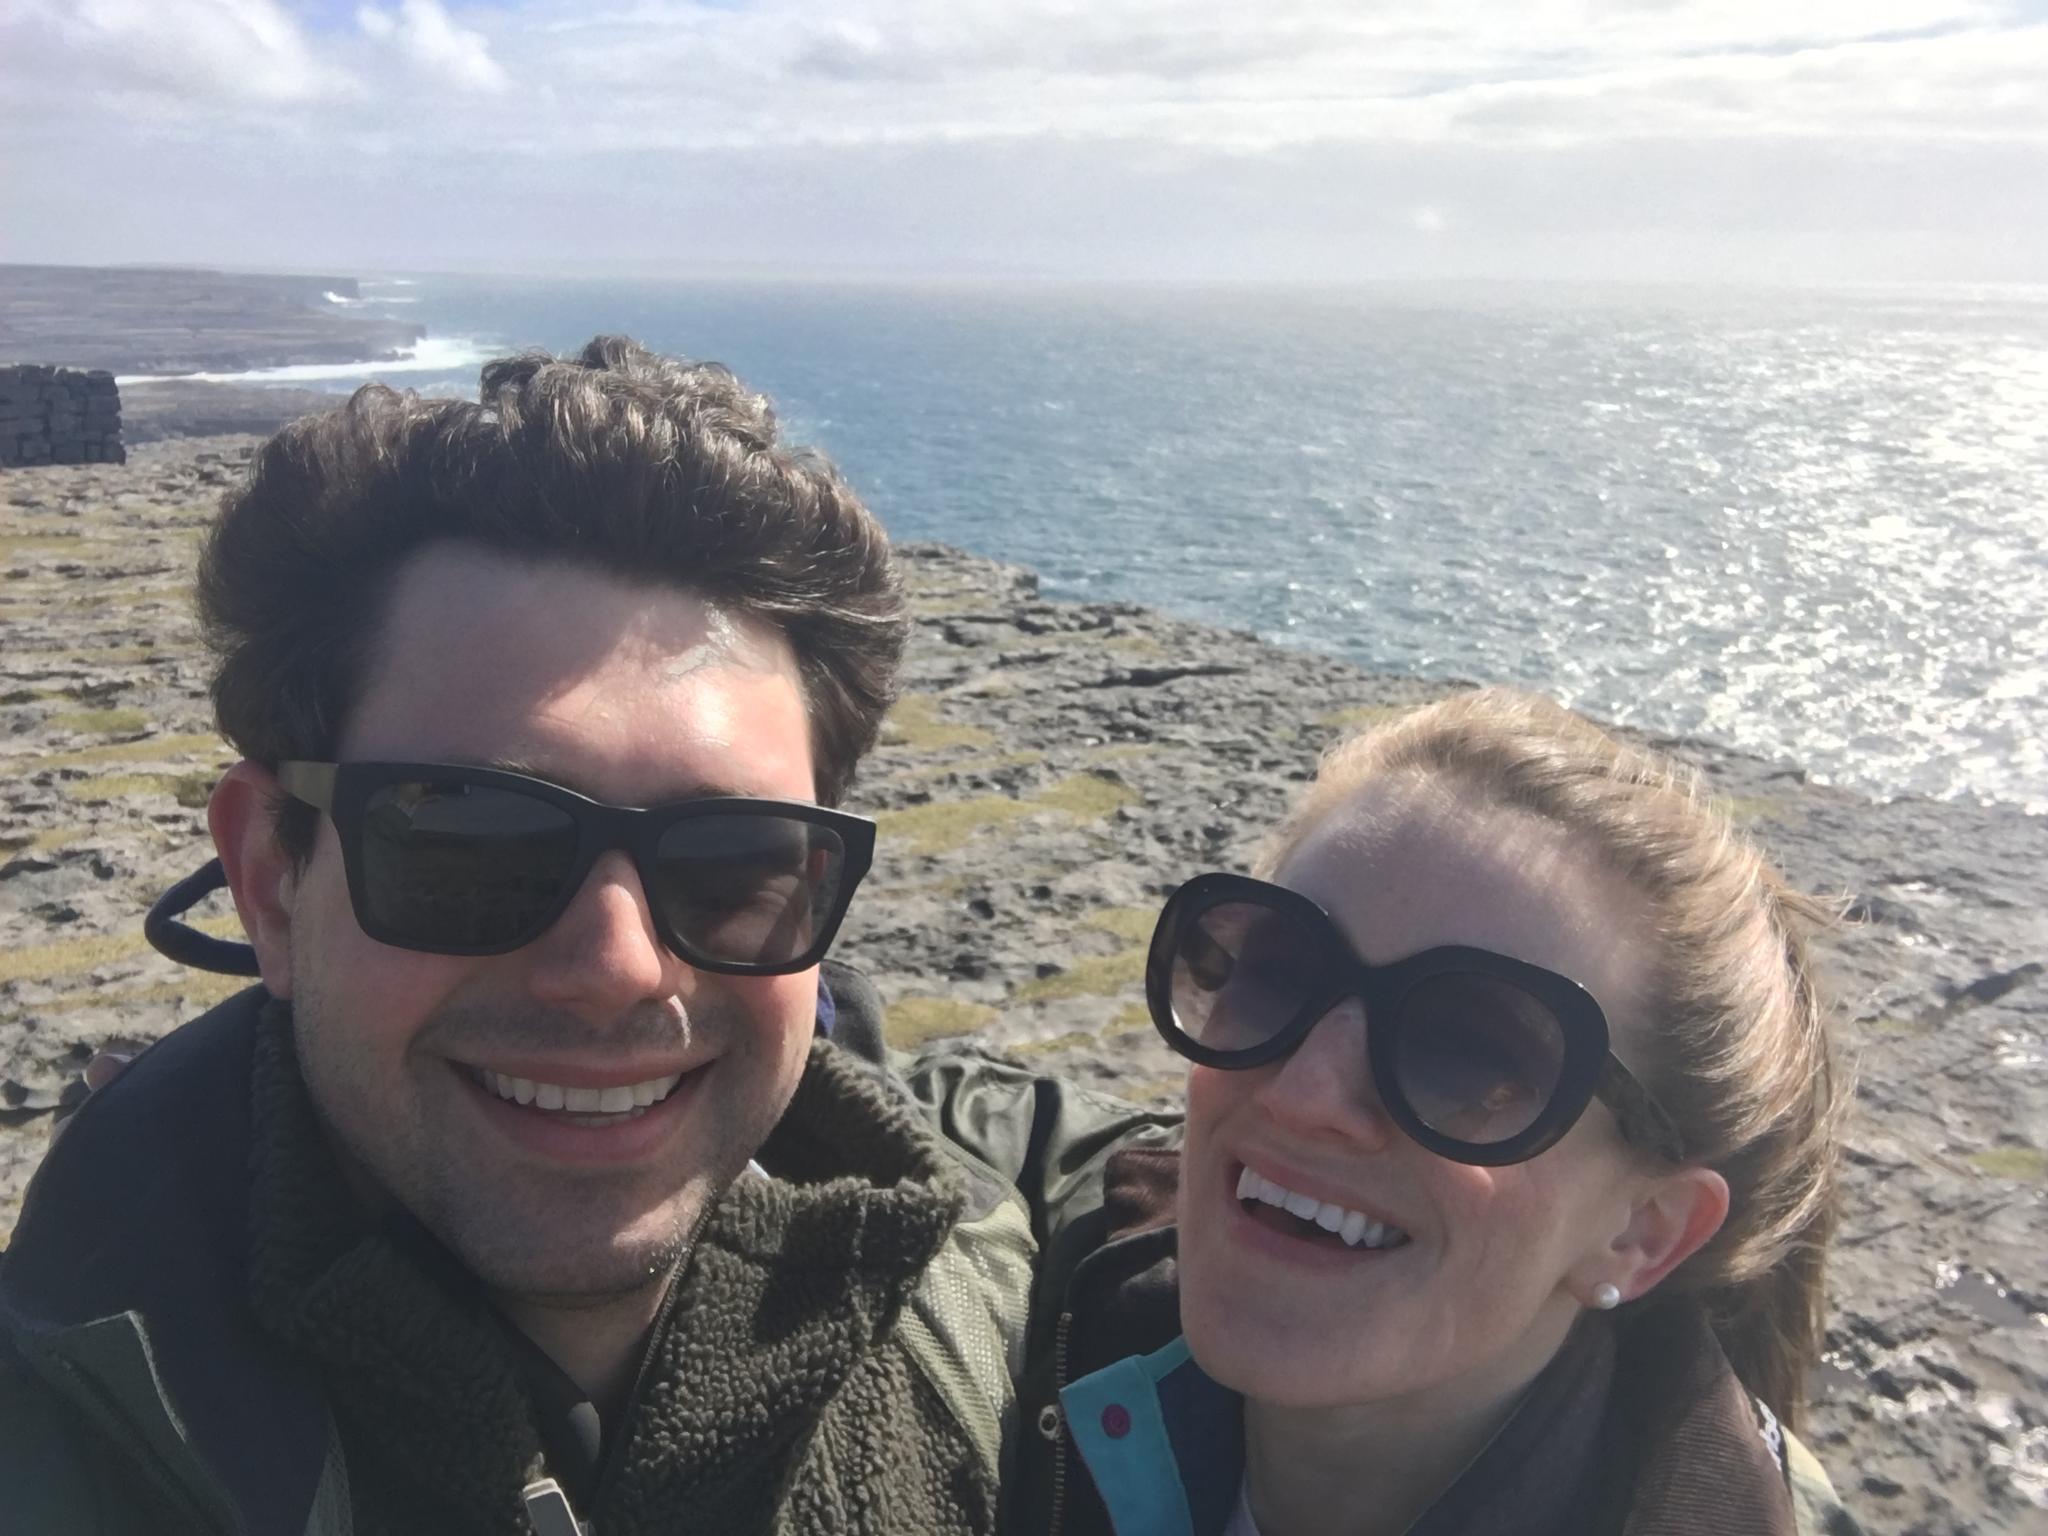 Aran Islands, Ireland, March 2018